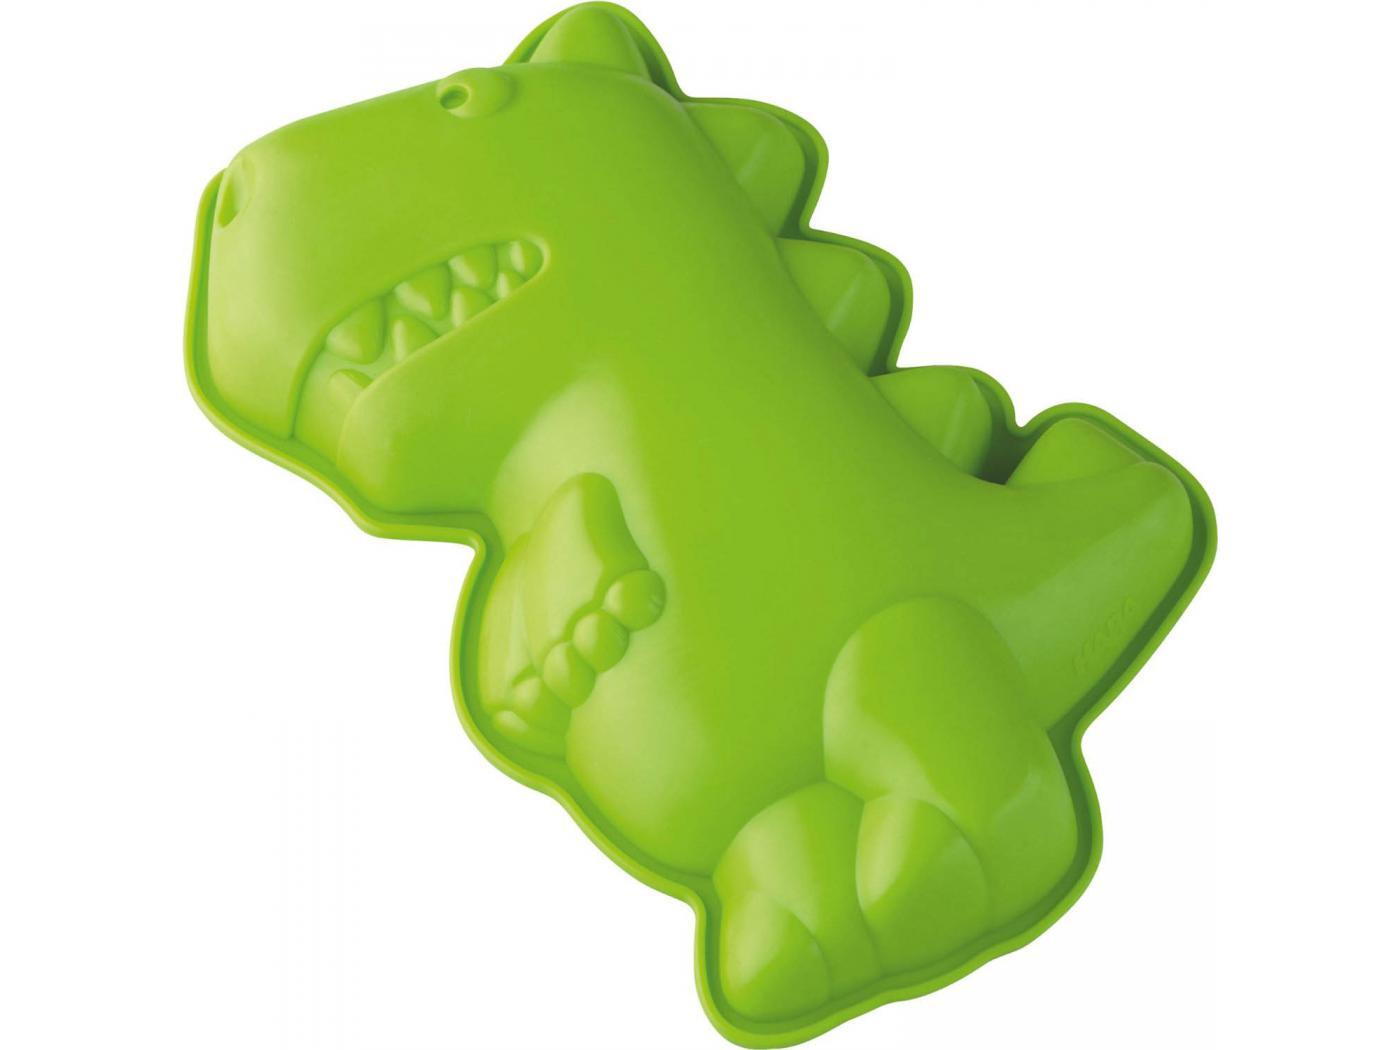 Haba moule g teau en silicone dinosaure - Moule a gateau silicone ...